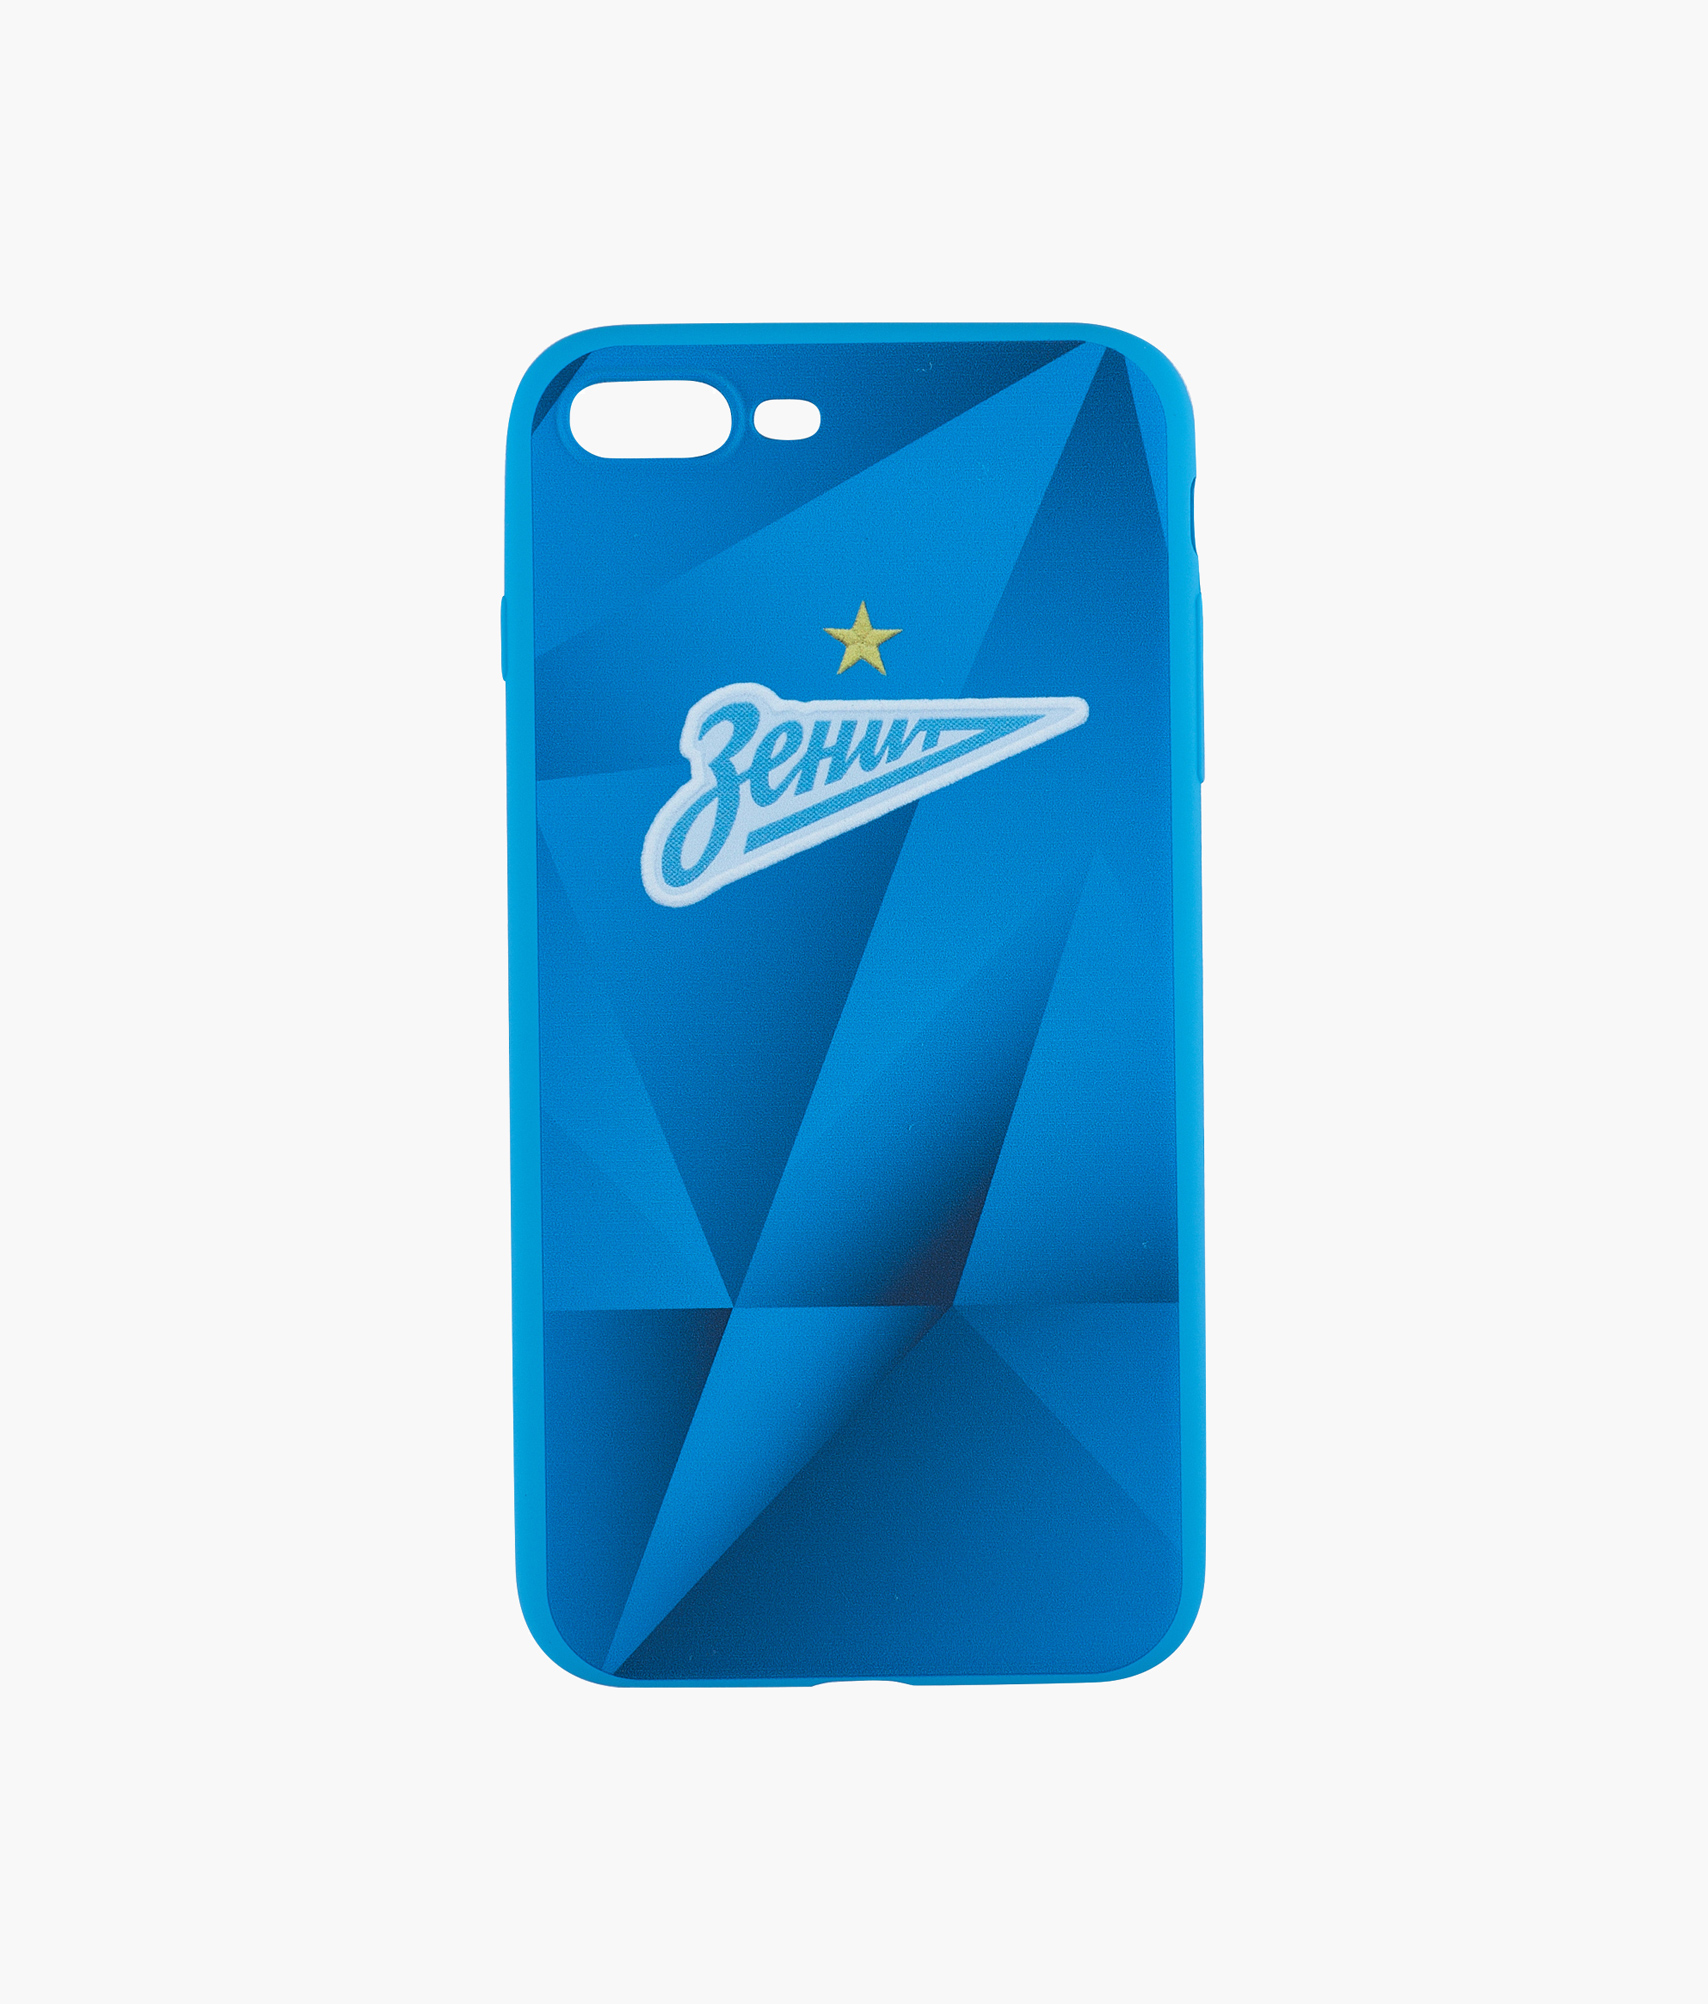 Фото - Чехол для IPhone 7/8 Plus «Форма 2019/20» Зенит Цвет-Синий кейс для назначение apple iphone 8 iphone 8 plus кейс для iphone 5 iphone 6 iphone 6 plus iphone 7 plus iphone 7 со стендом с окошком флип